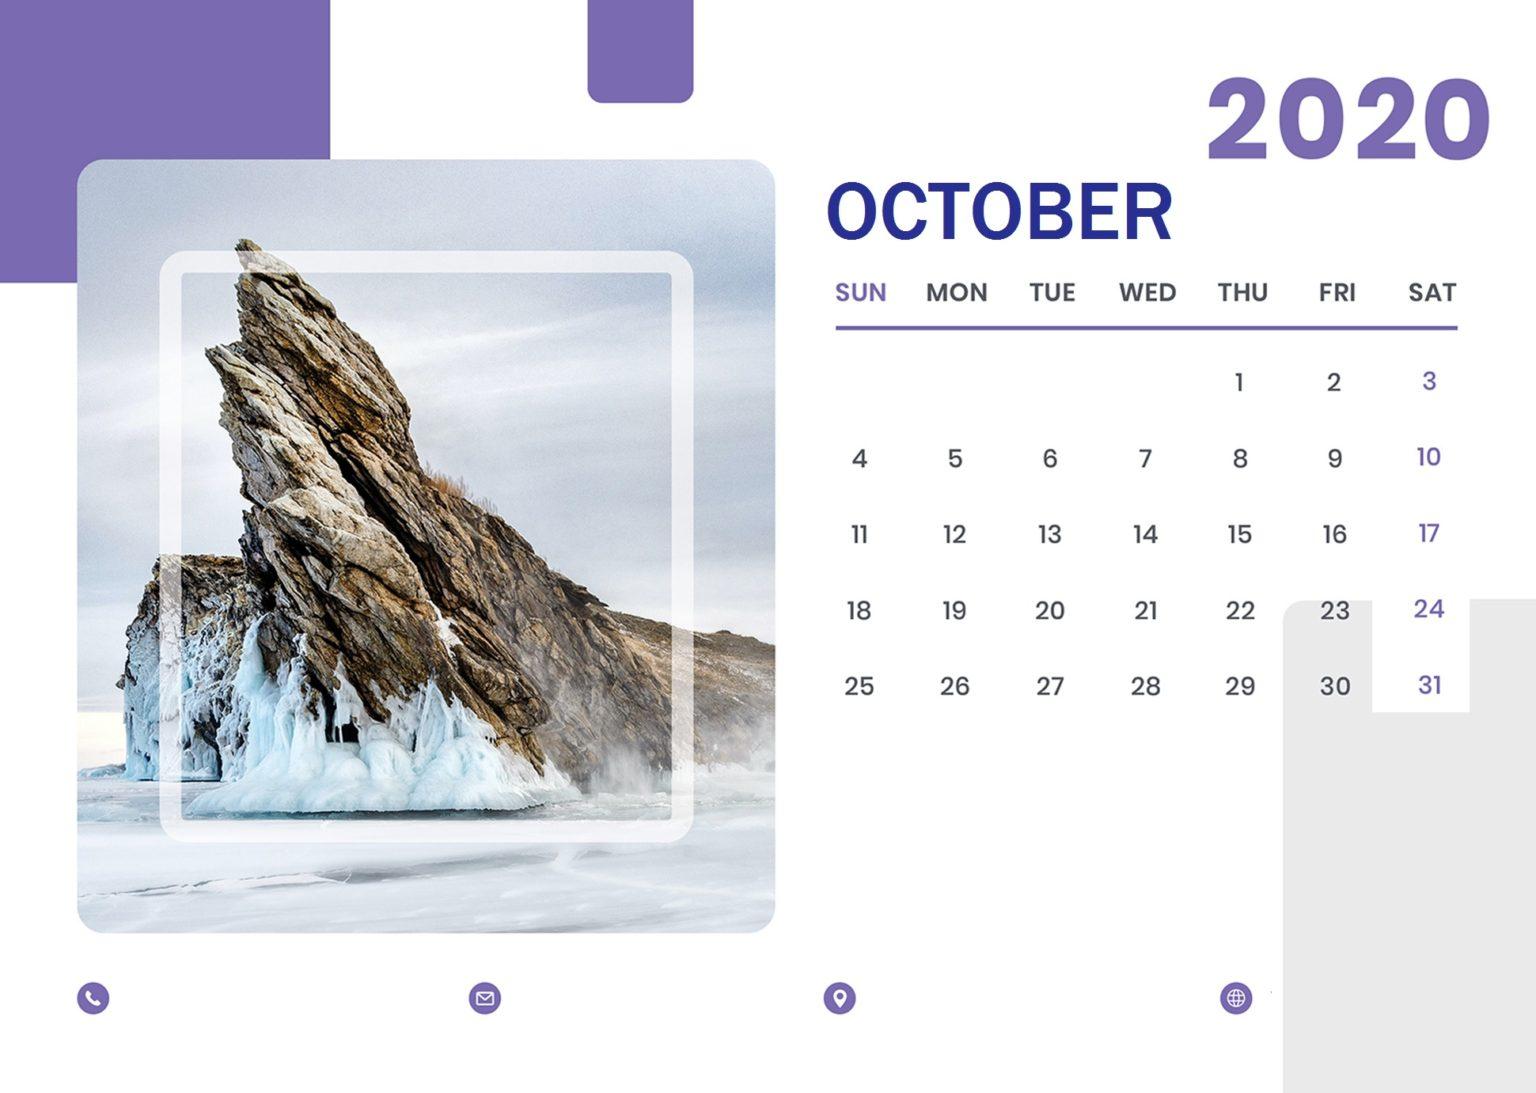 October 2020 Professional Calendar